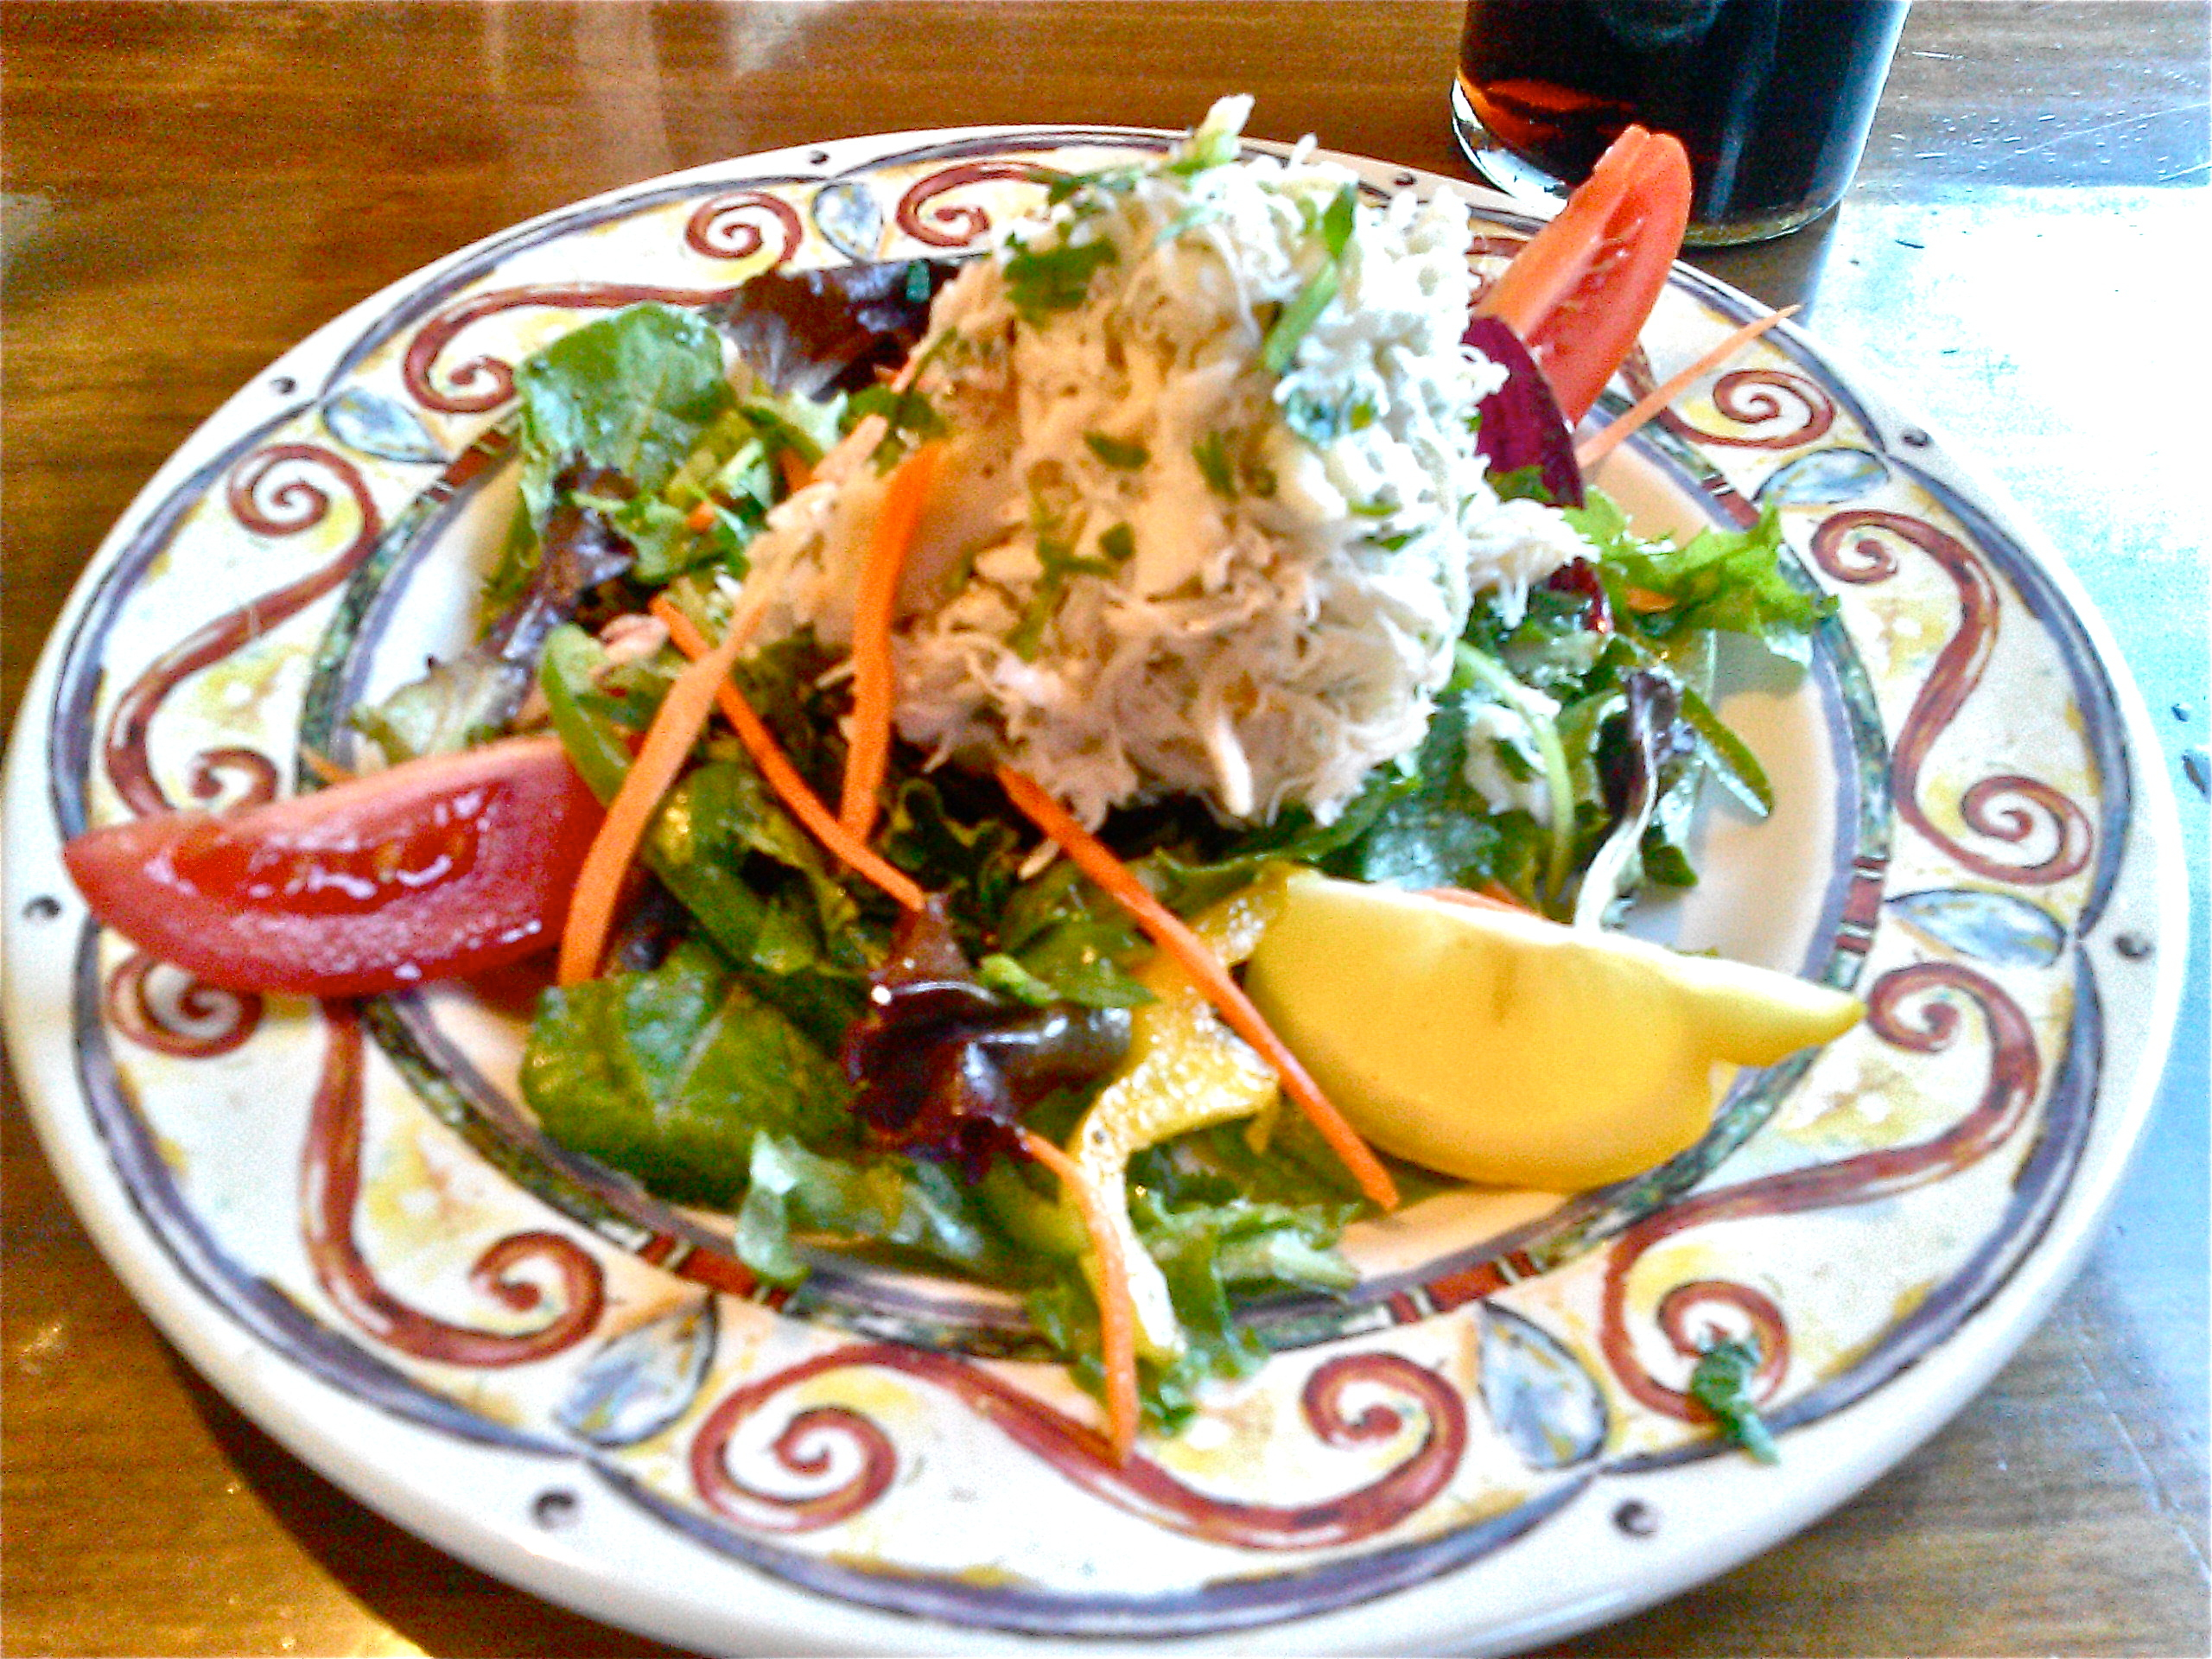 Saylor's Restaurant & Bar image 14